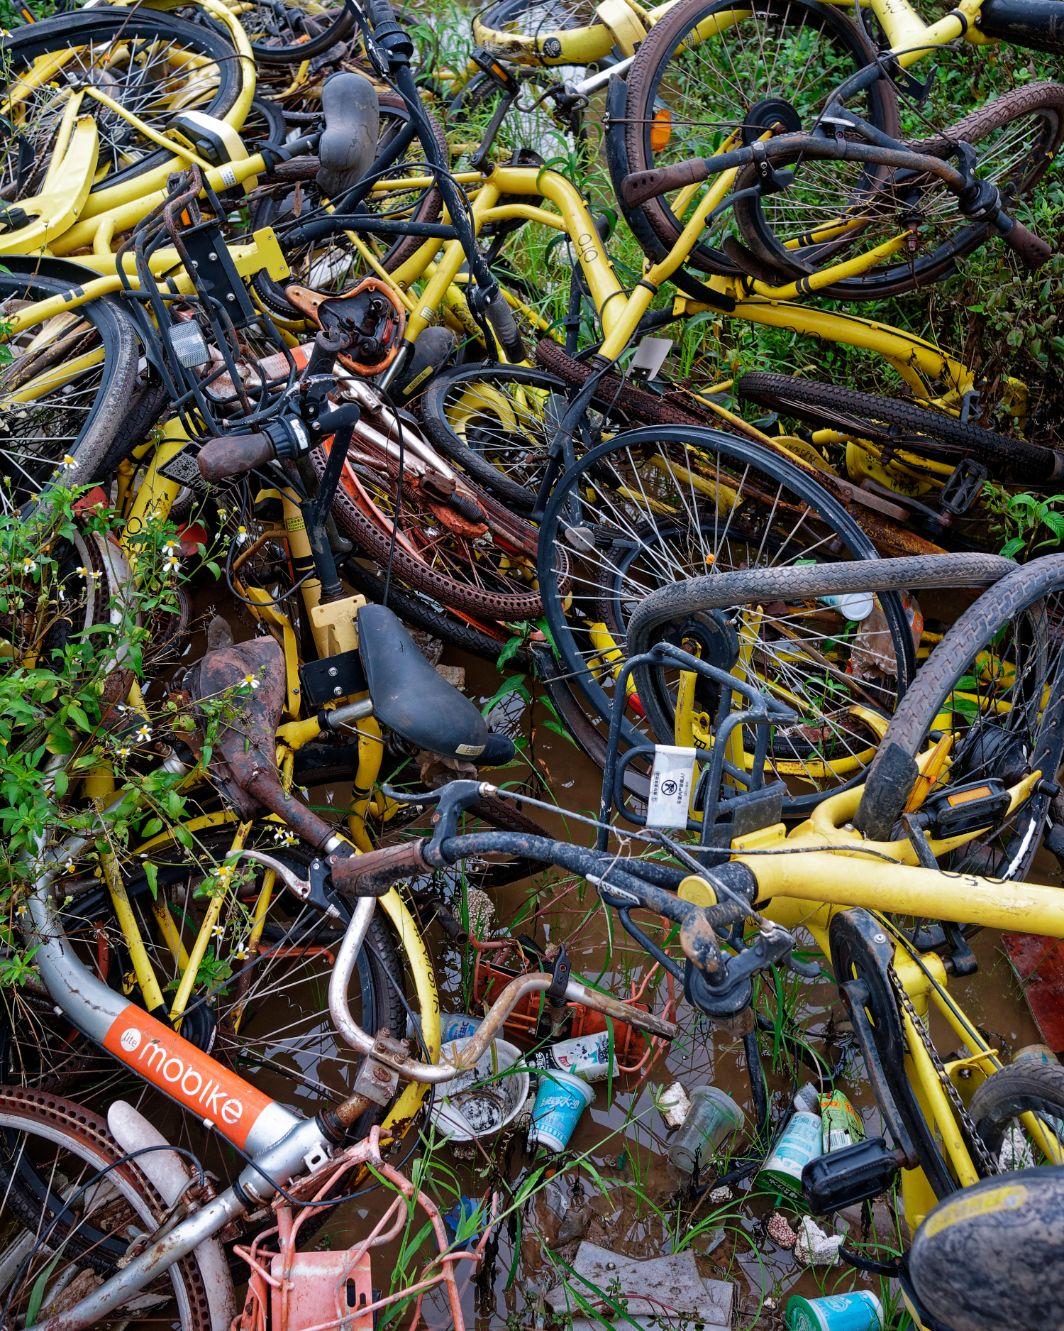 Rotting-Bikes-51---Frantabina-1-.jpg